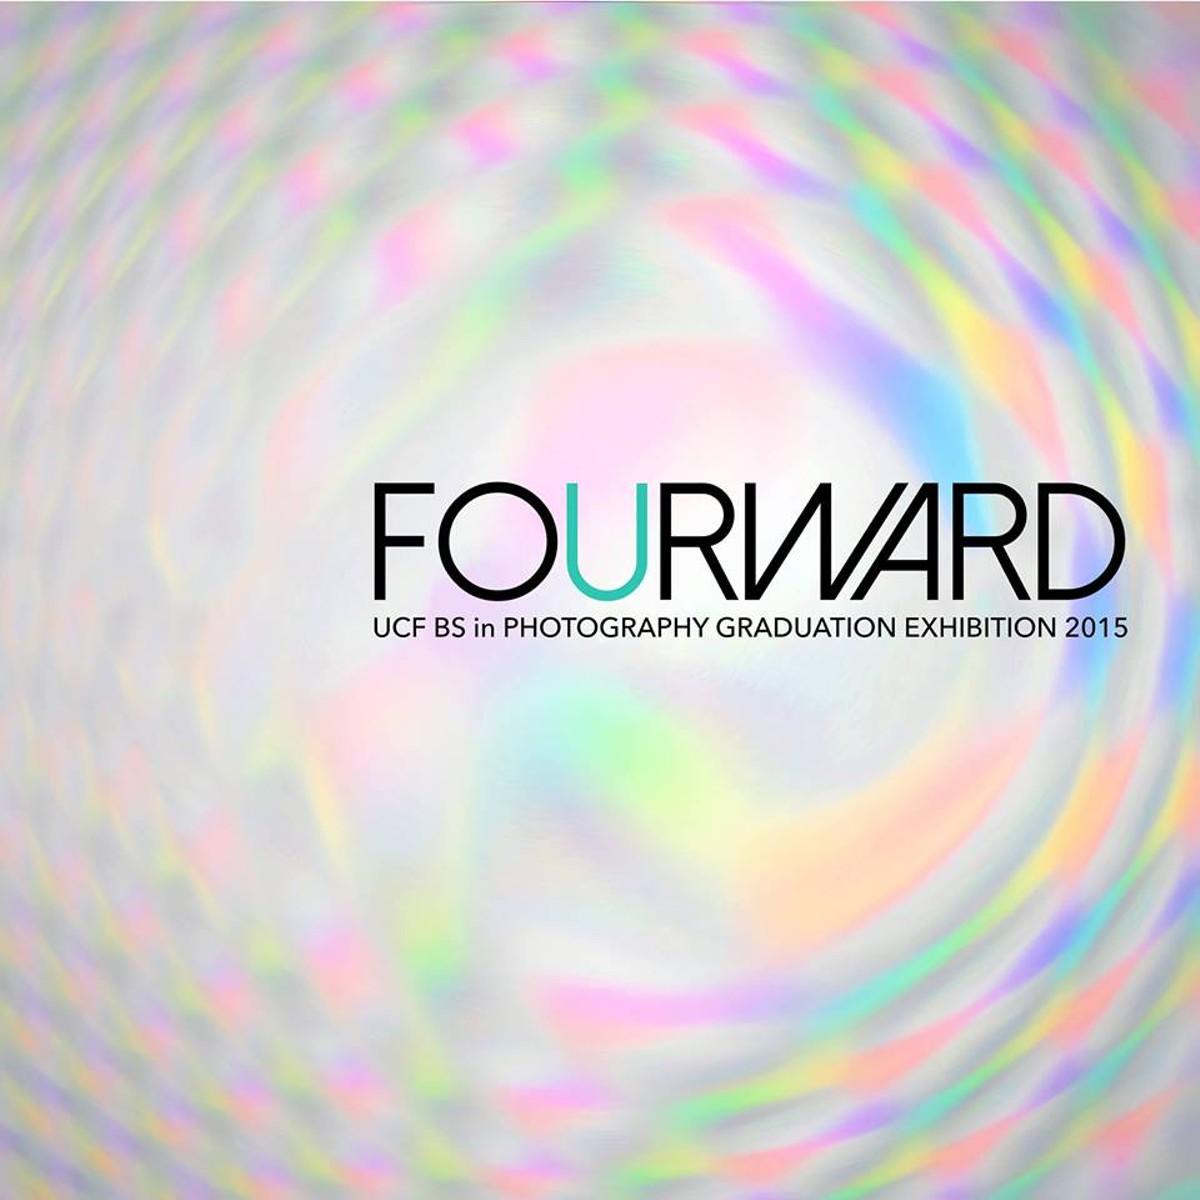 fourward.jpg